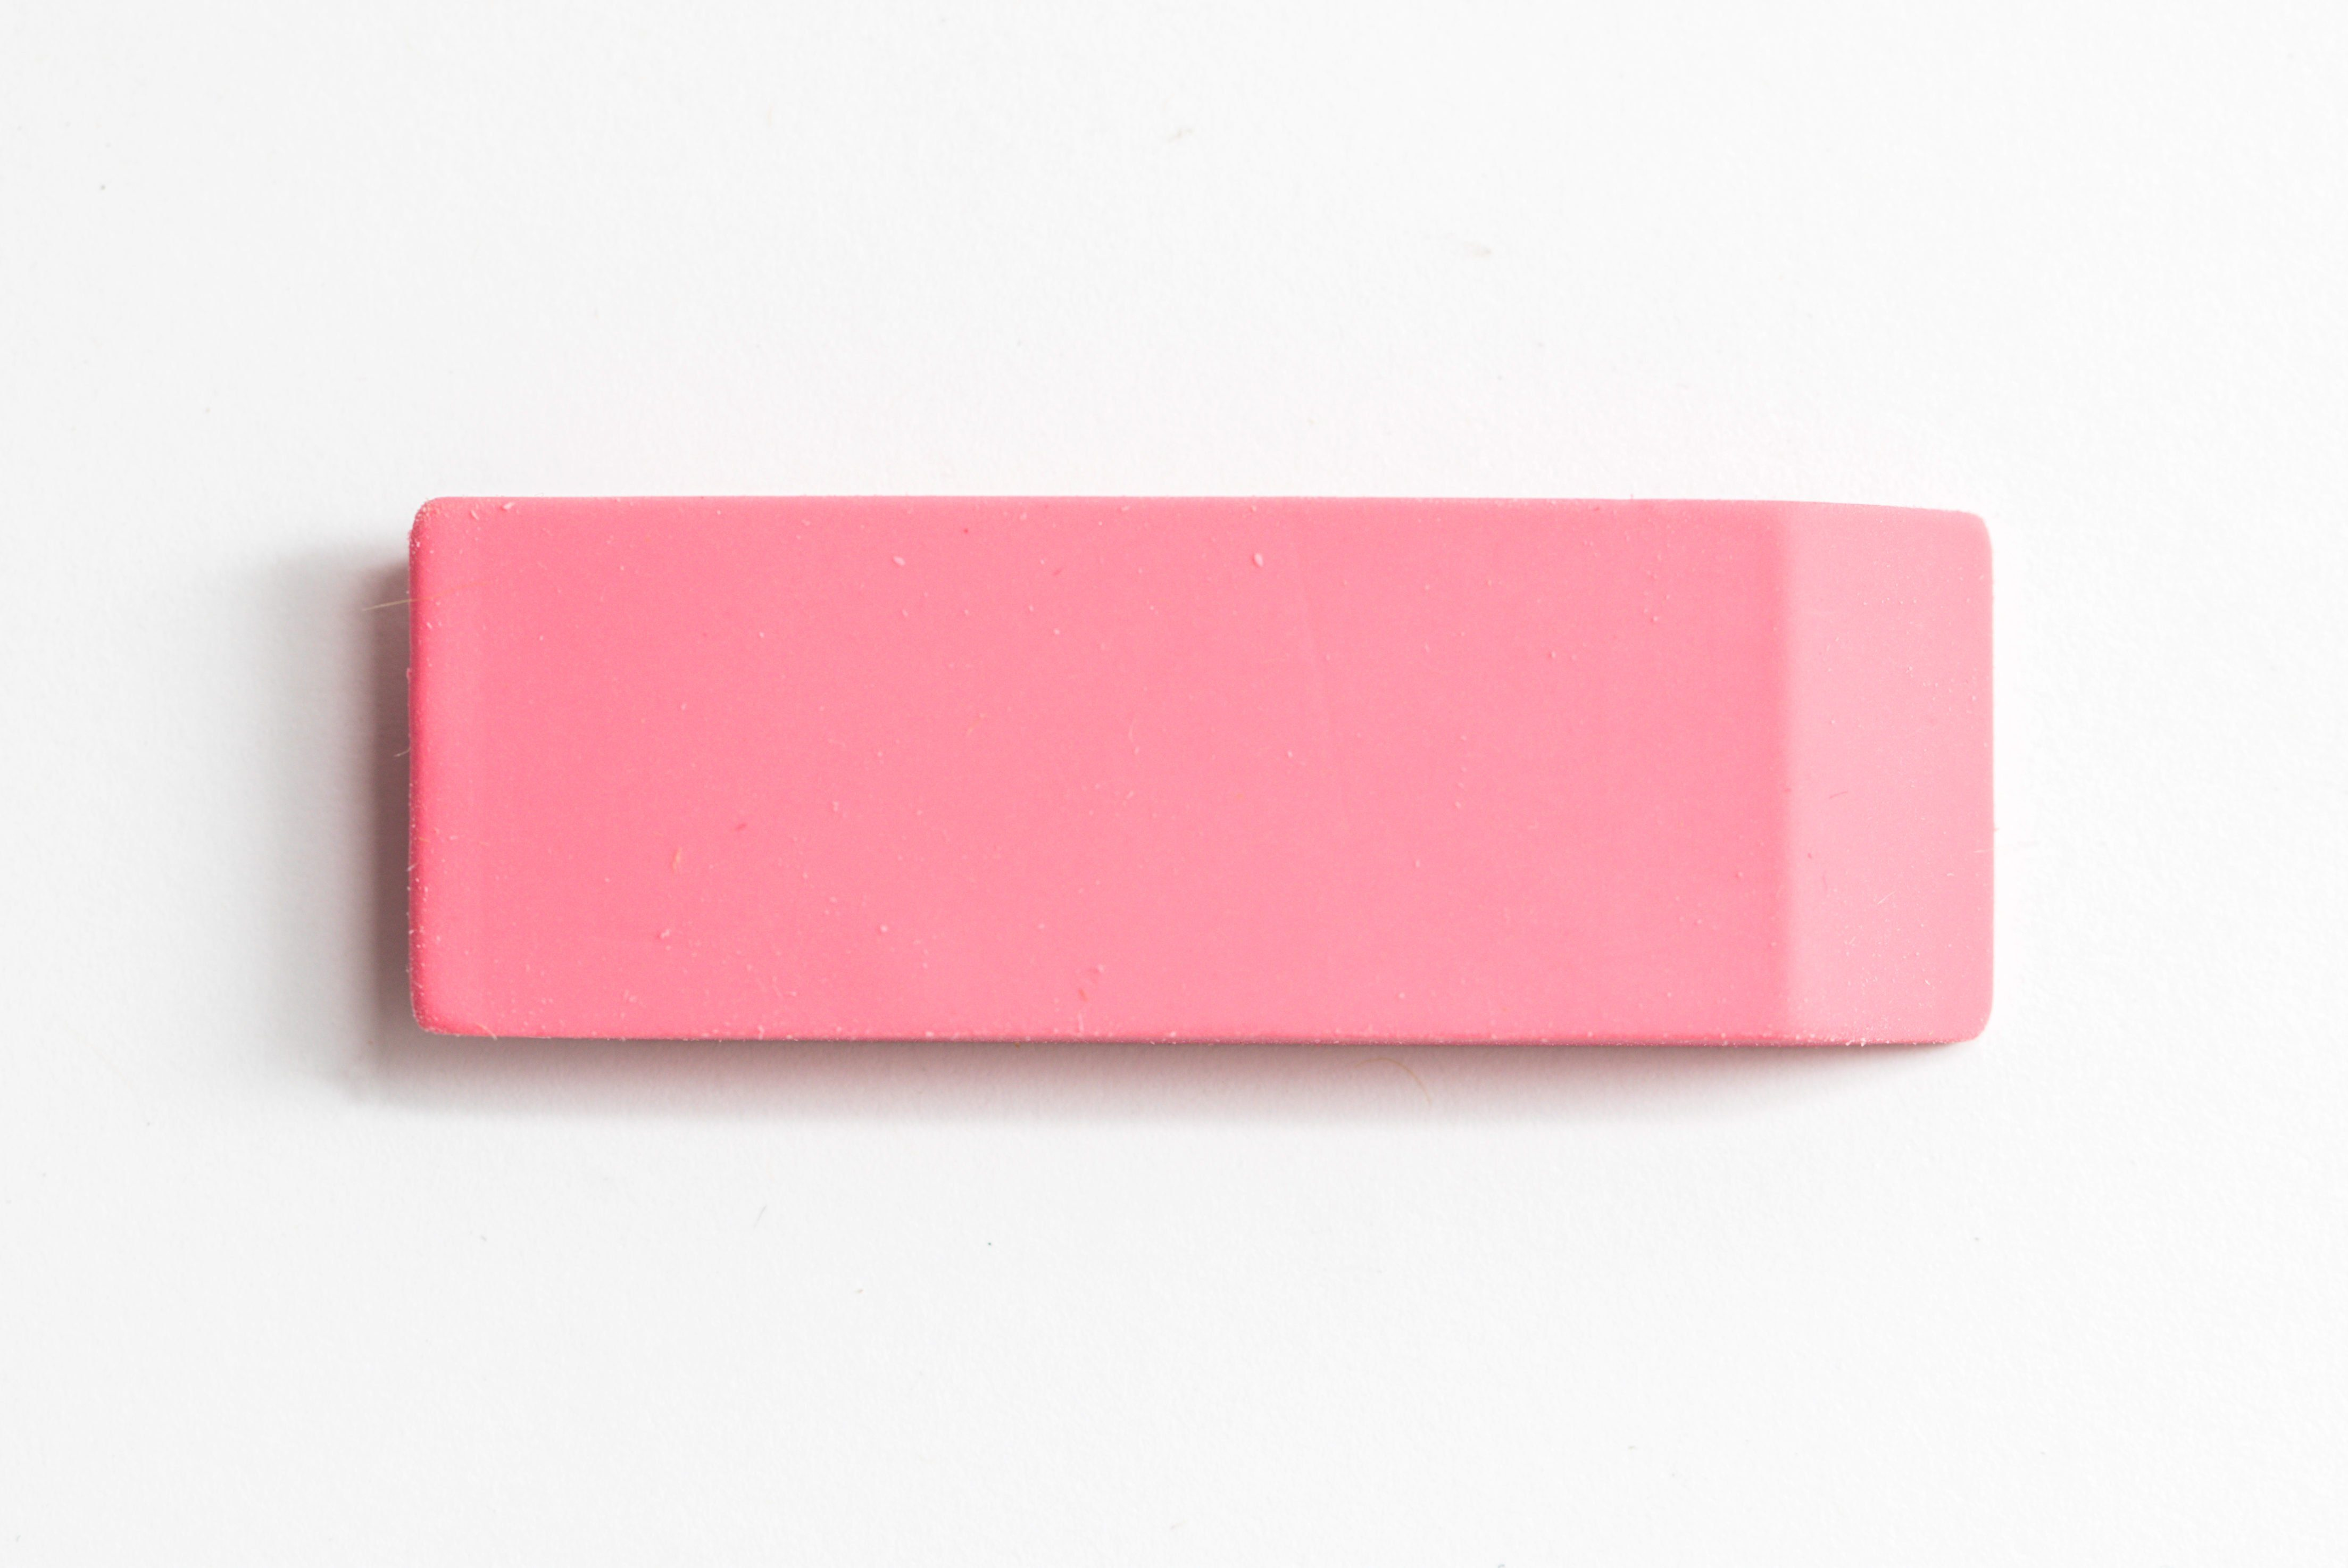 Pink eraser shot up close against a white background